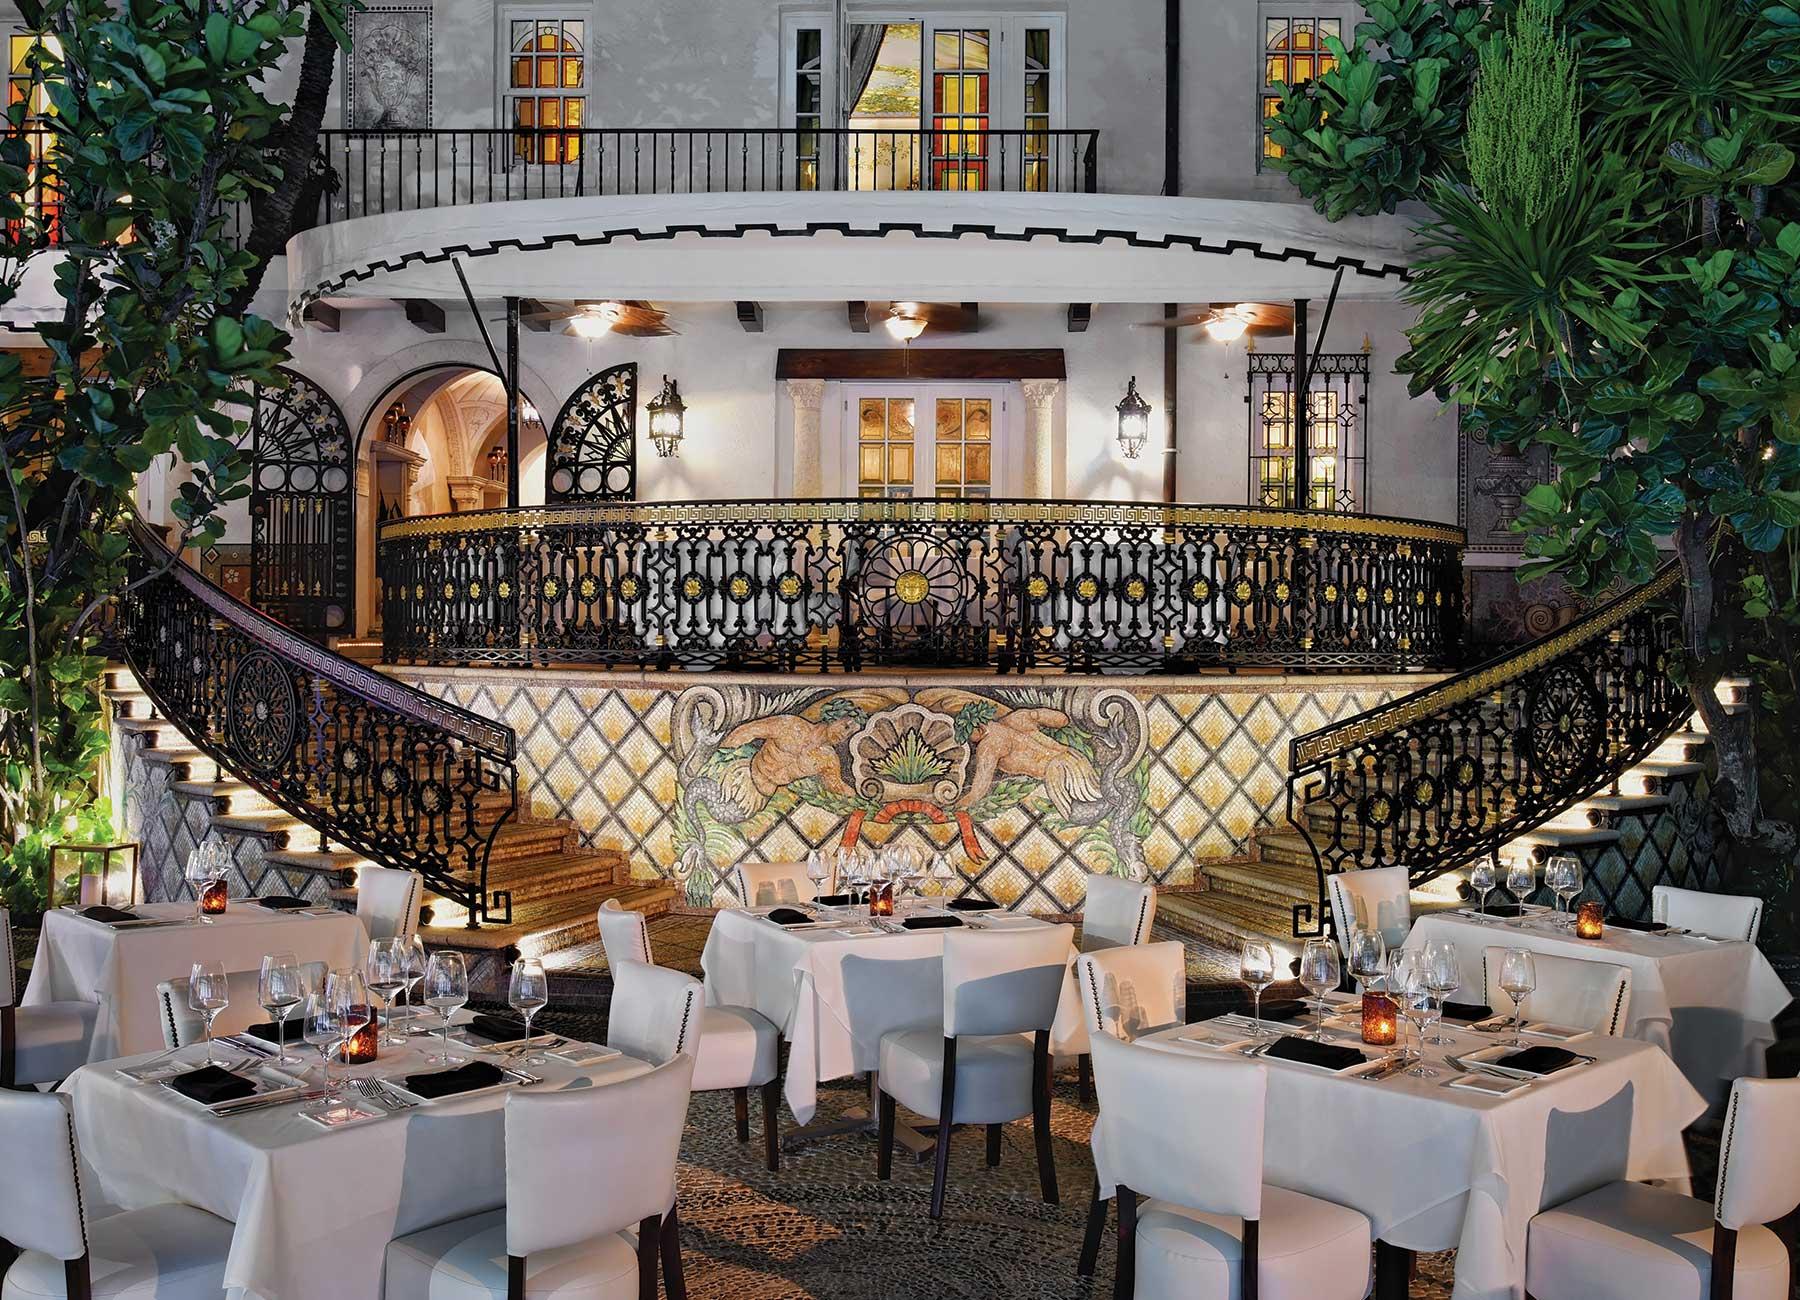 Gianni S Restaurant Blend Of Italian Mediterranean Food The Villa